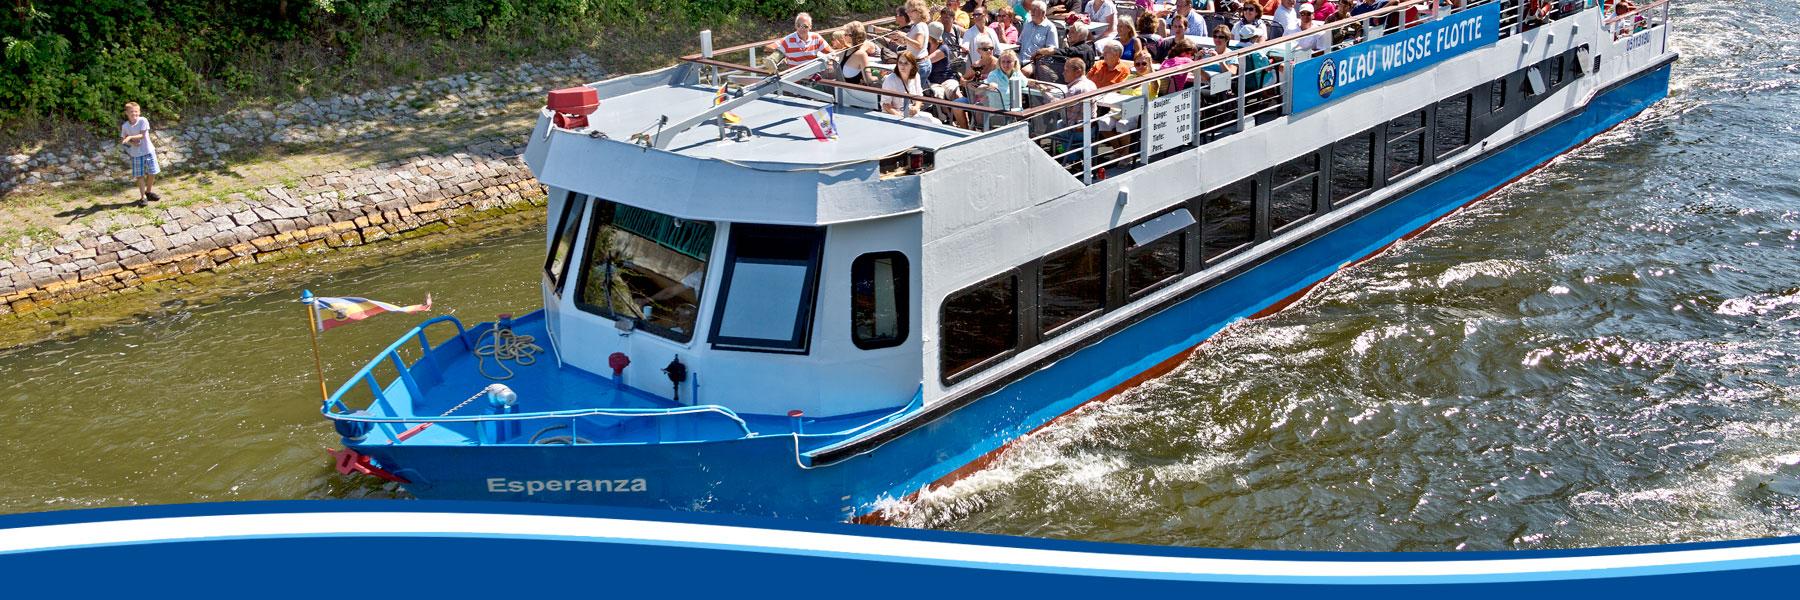 Ms Esperanza - Blau Weisse Flotte Müritz & Seen in Waren